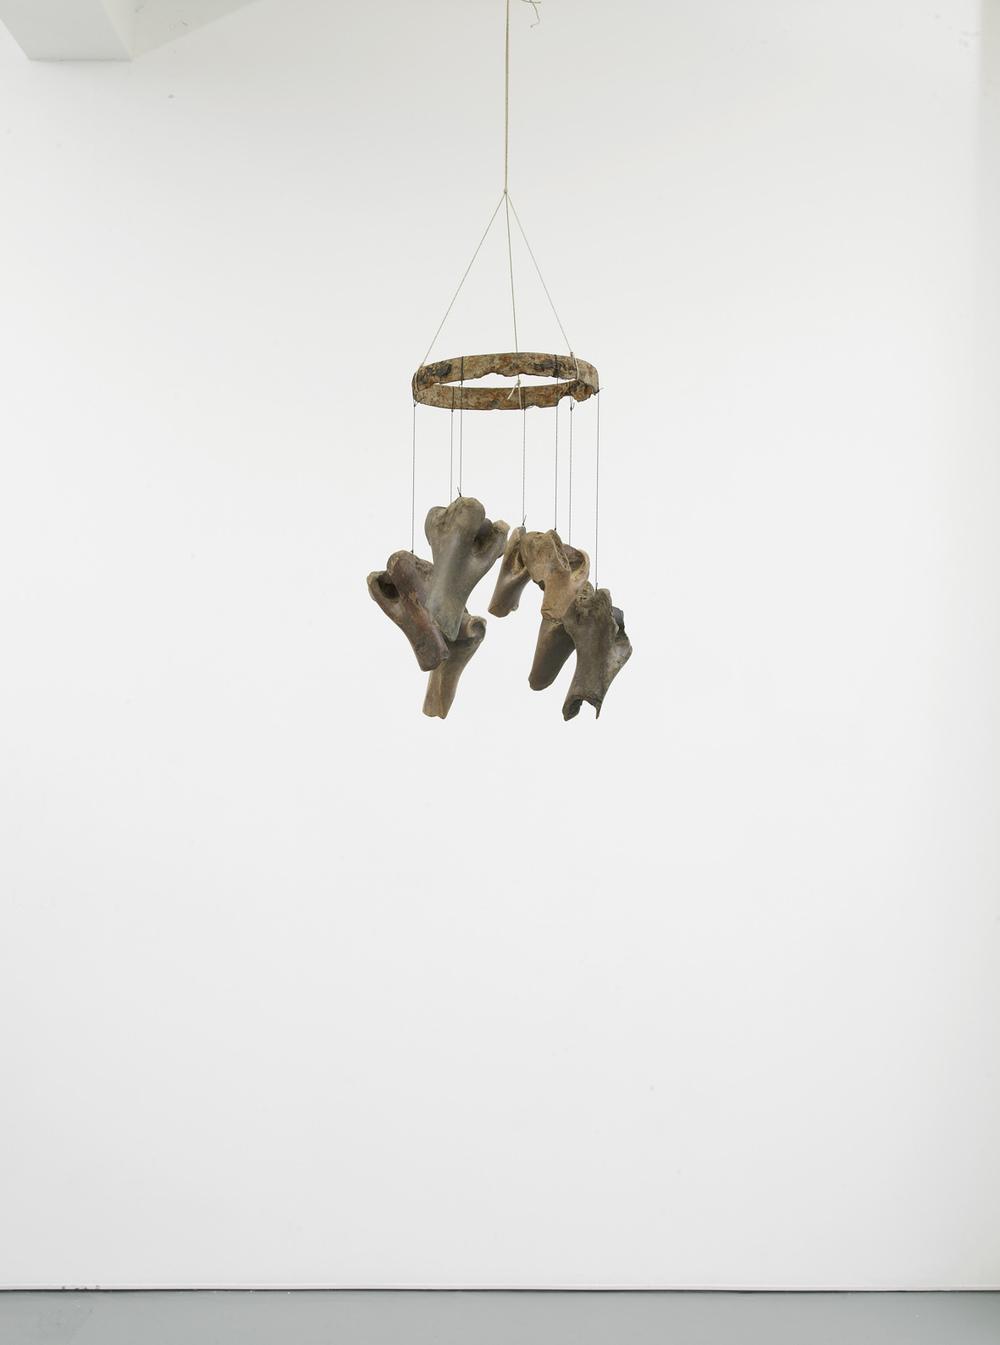 Franziska Lantz THAMES, no title 2016 Metal, bones, rope, string 47 x 30 x 30 cm / 18.5 x 11.8 x 11.8 in HS12-FL5510S